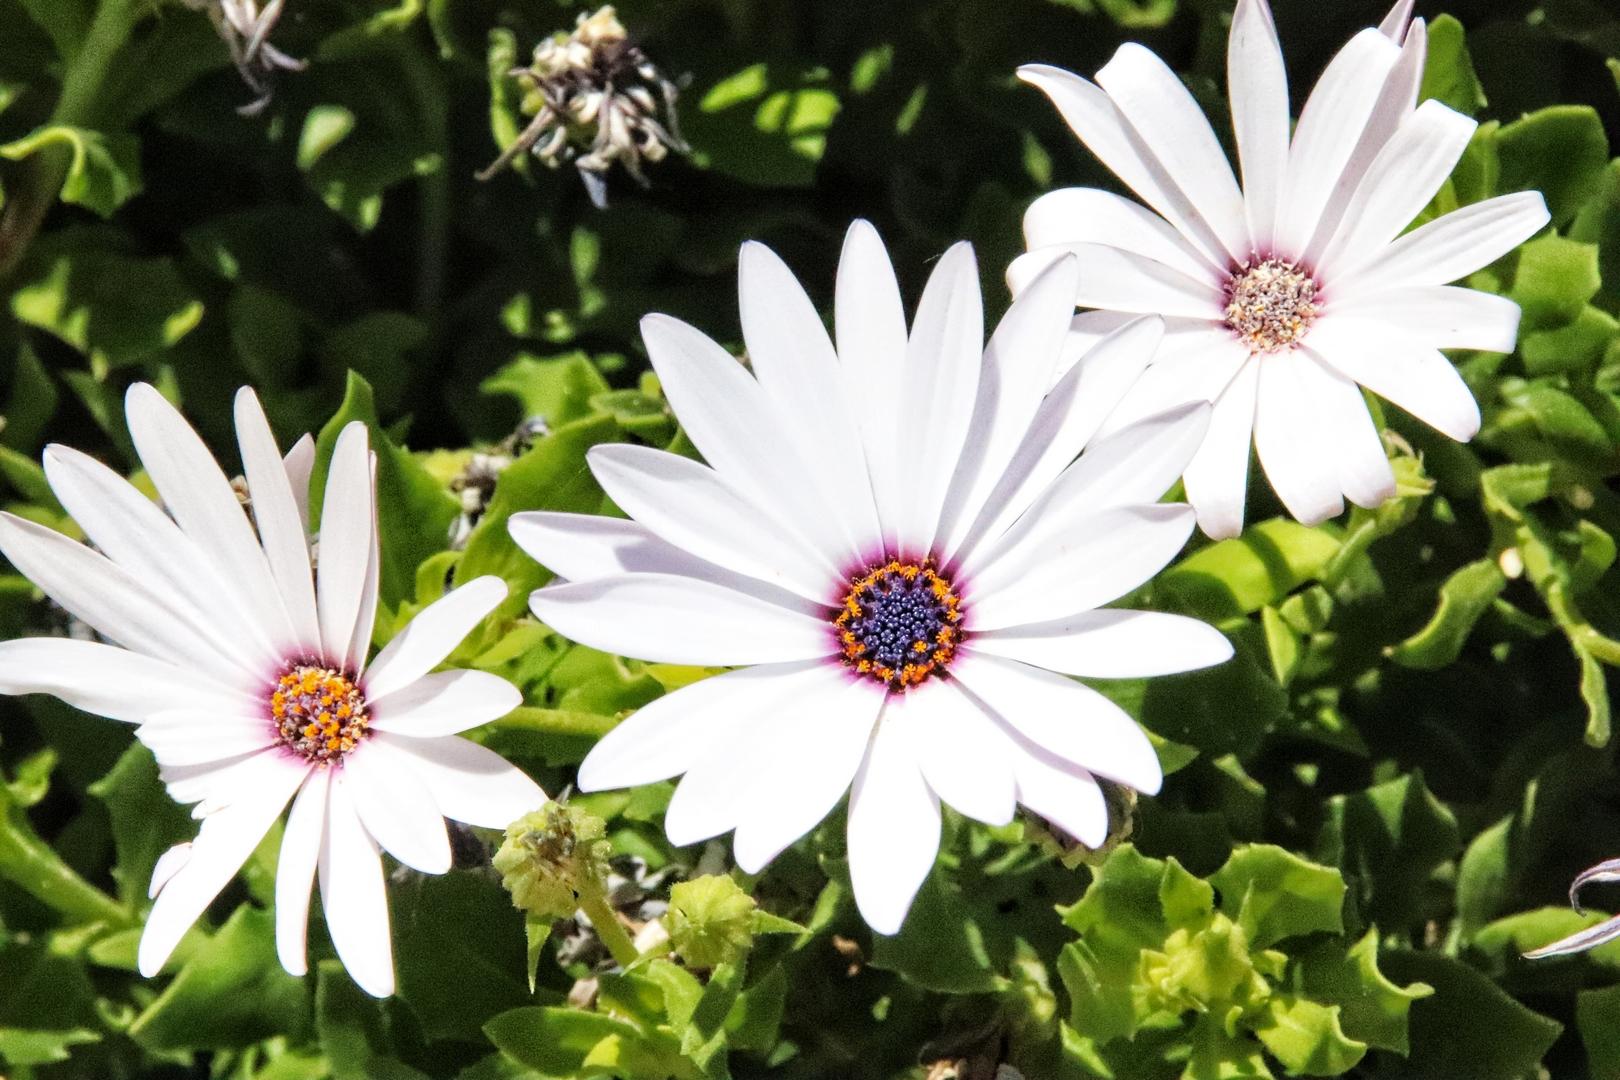 Jordanie - Fleurs blanches du Mont Nebo